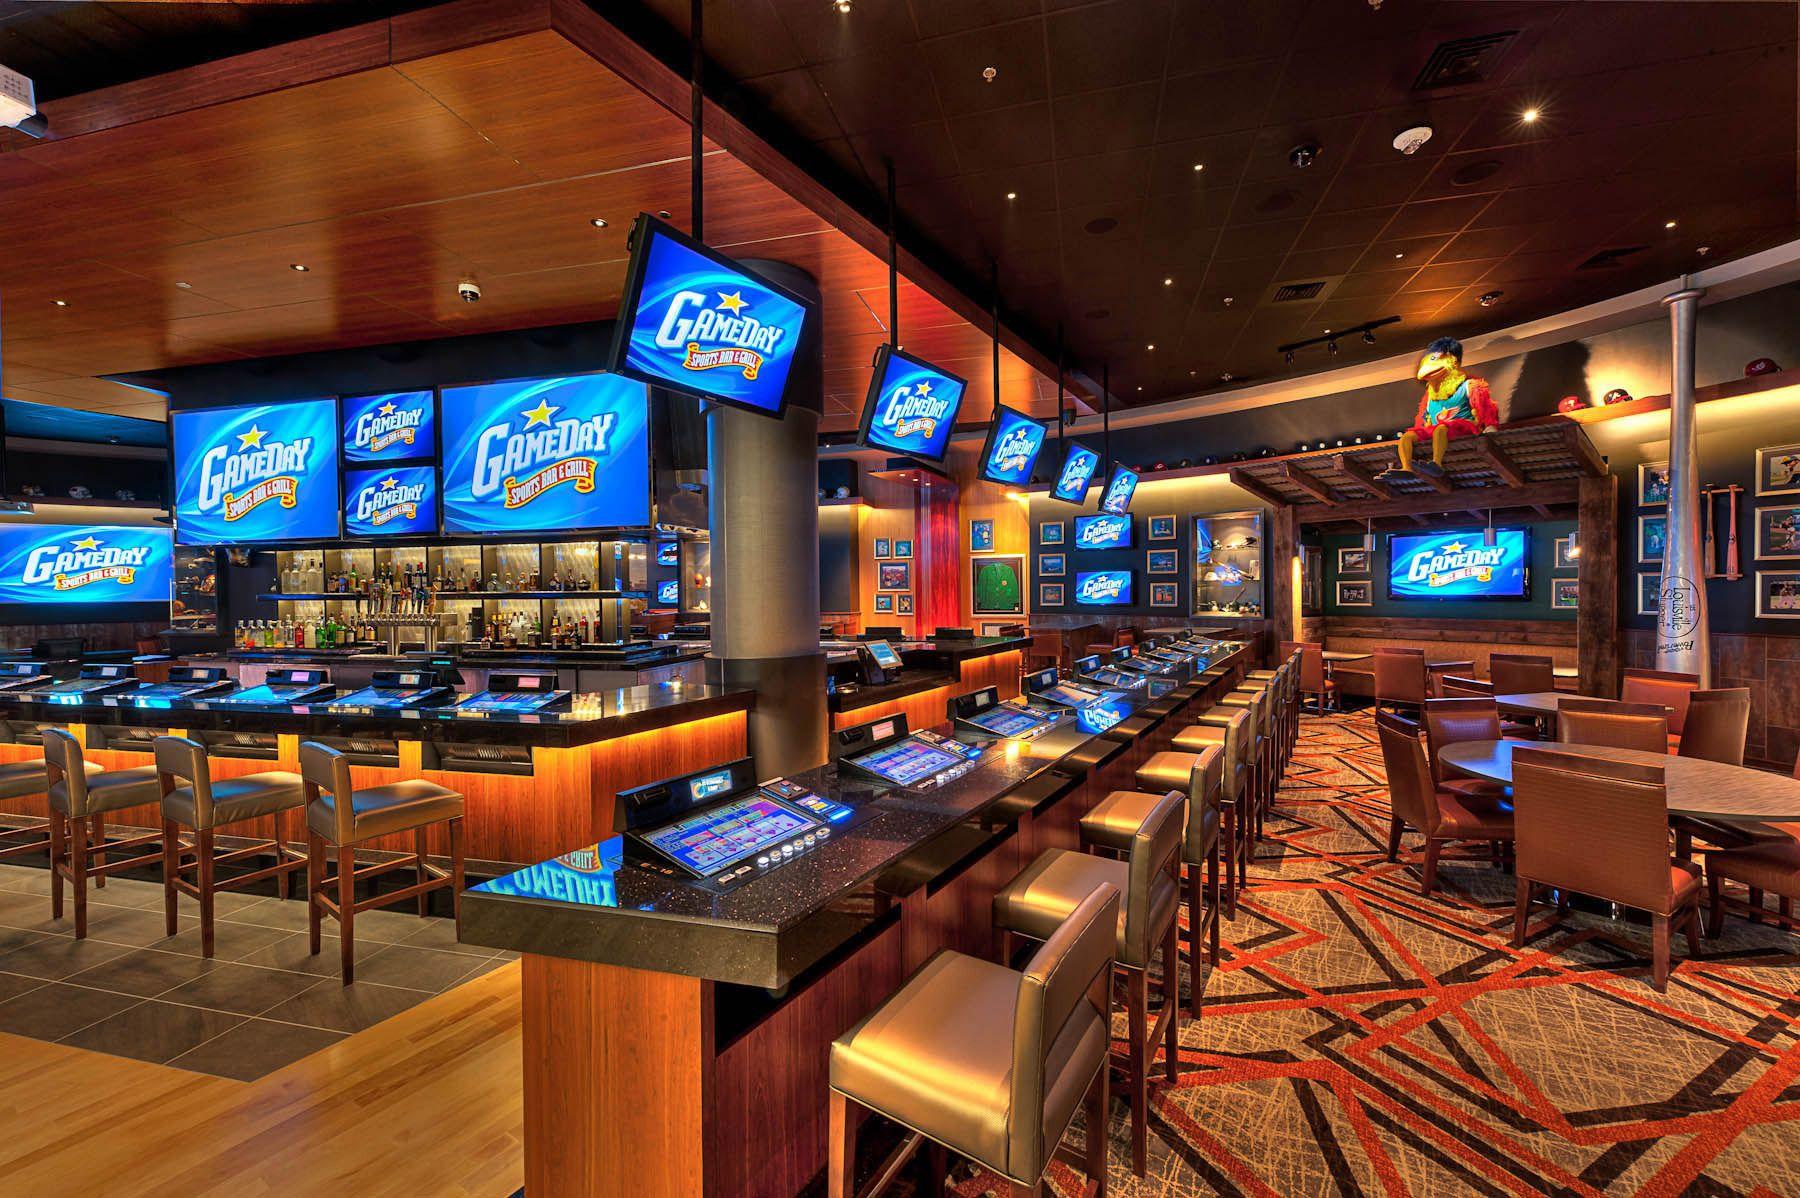 GameDay interior